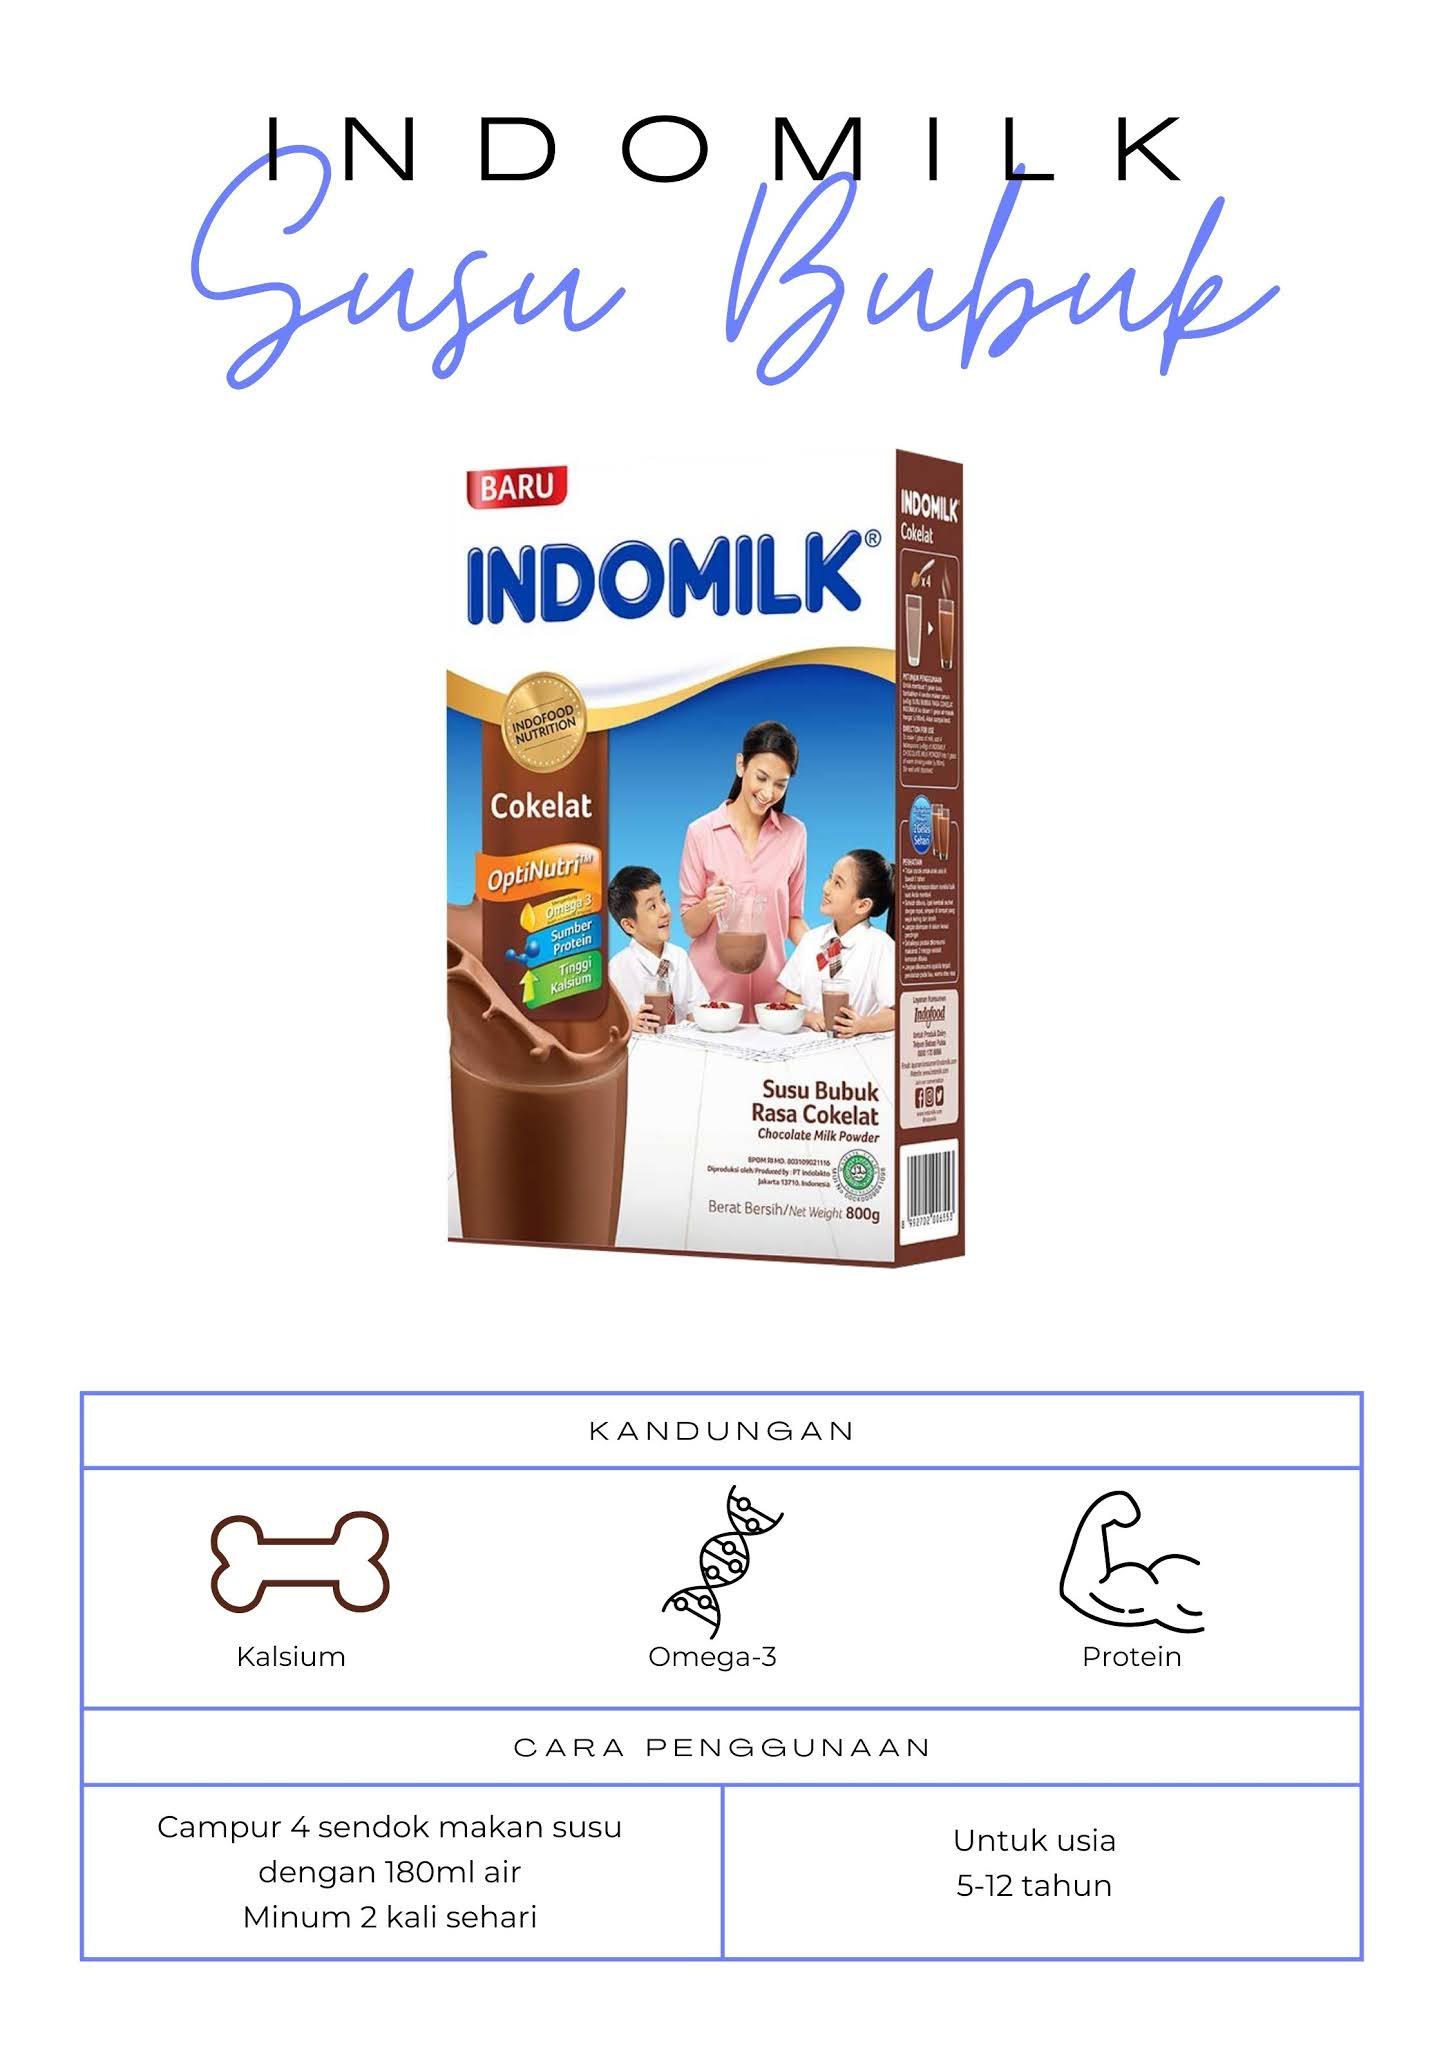 Indomilk Susu Bubuk untuk usia berapa ya?